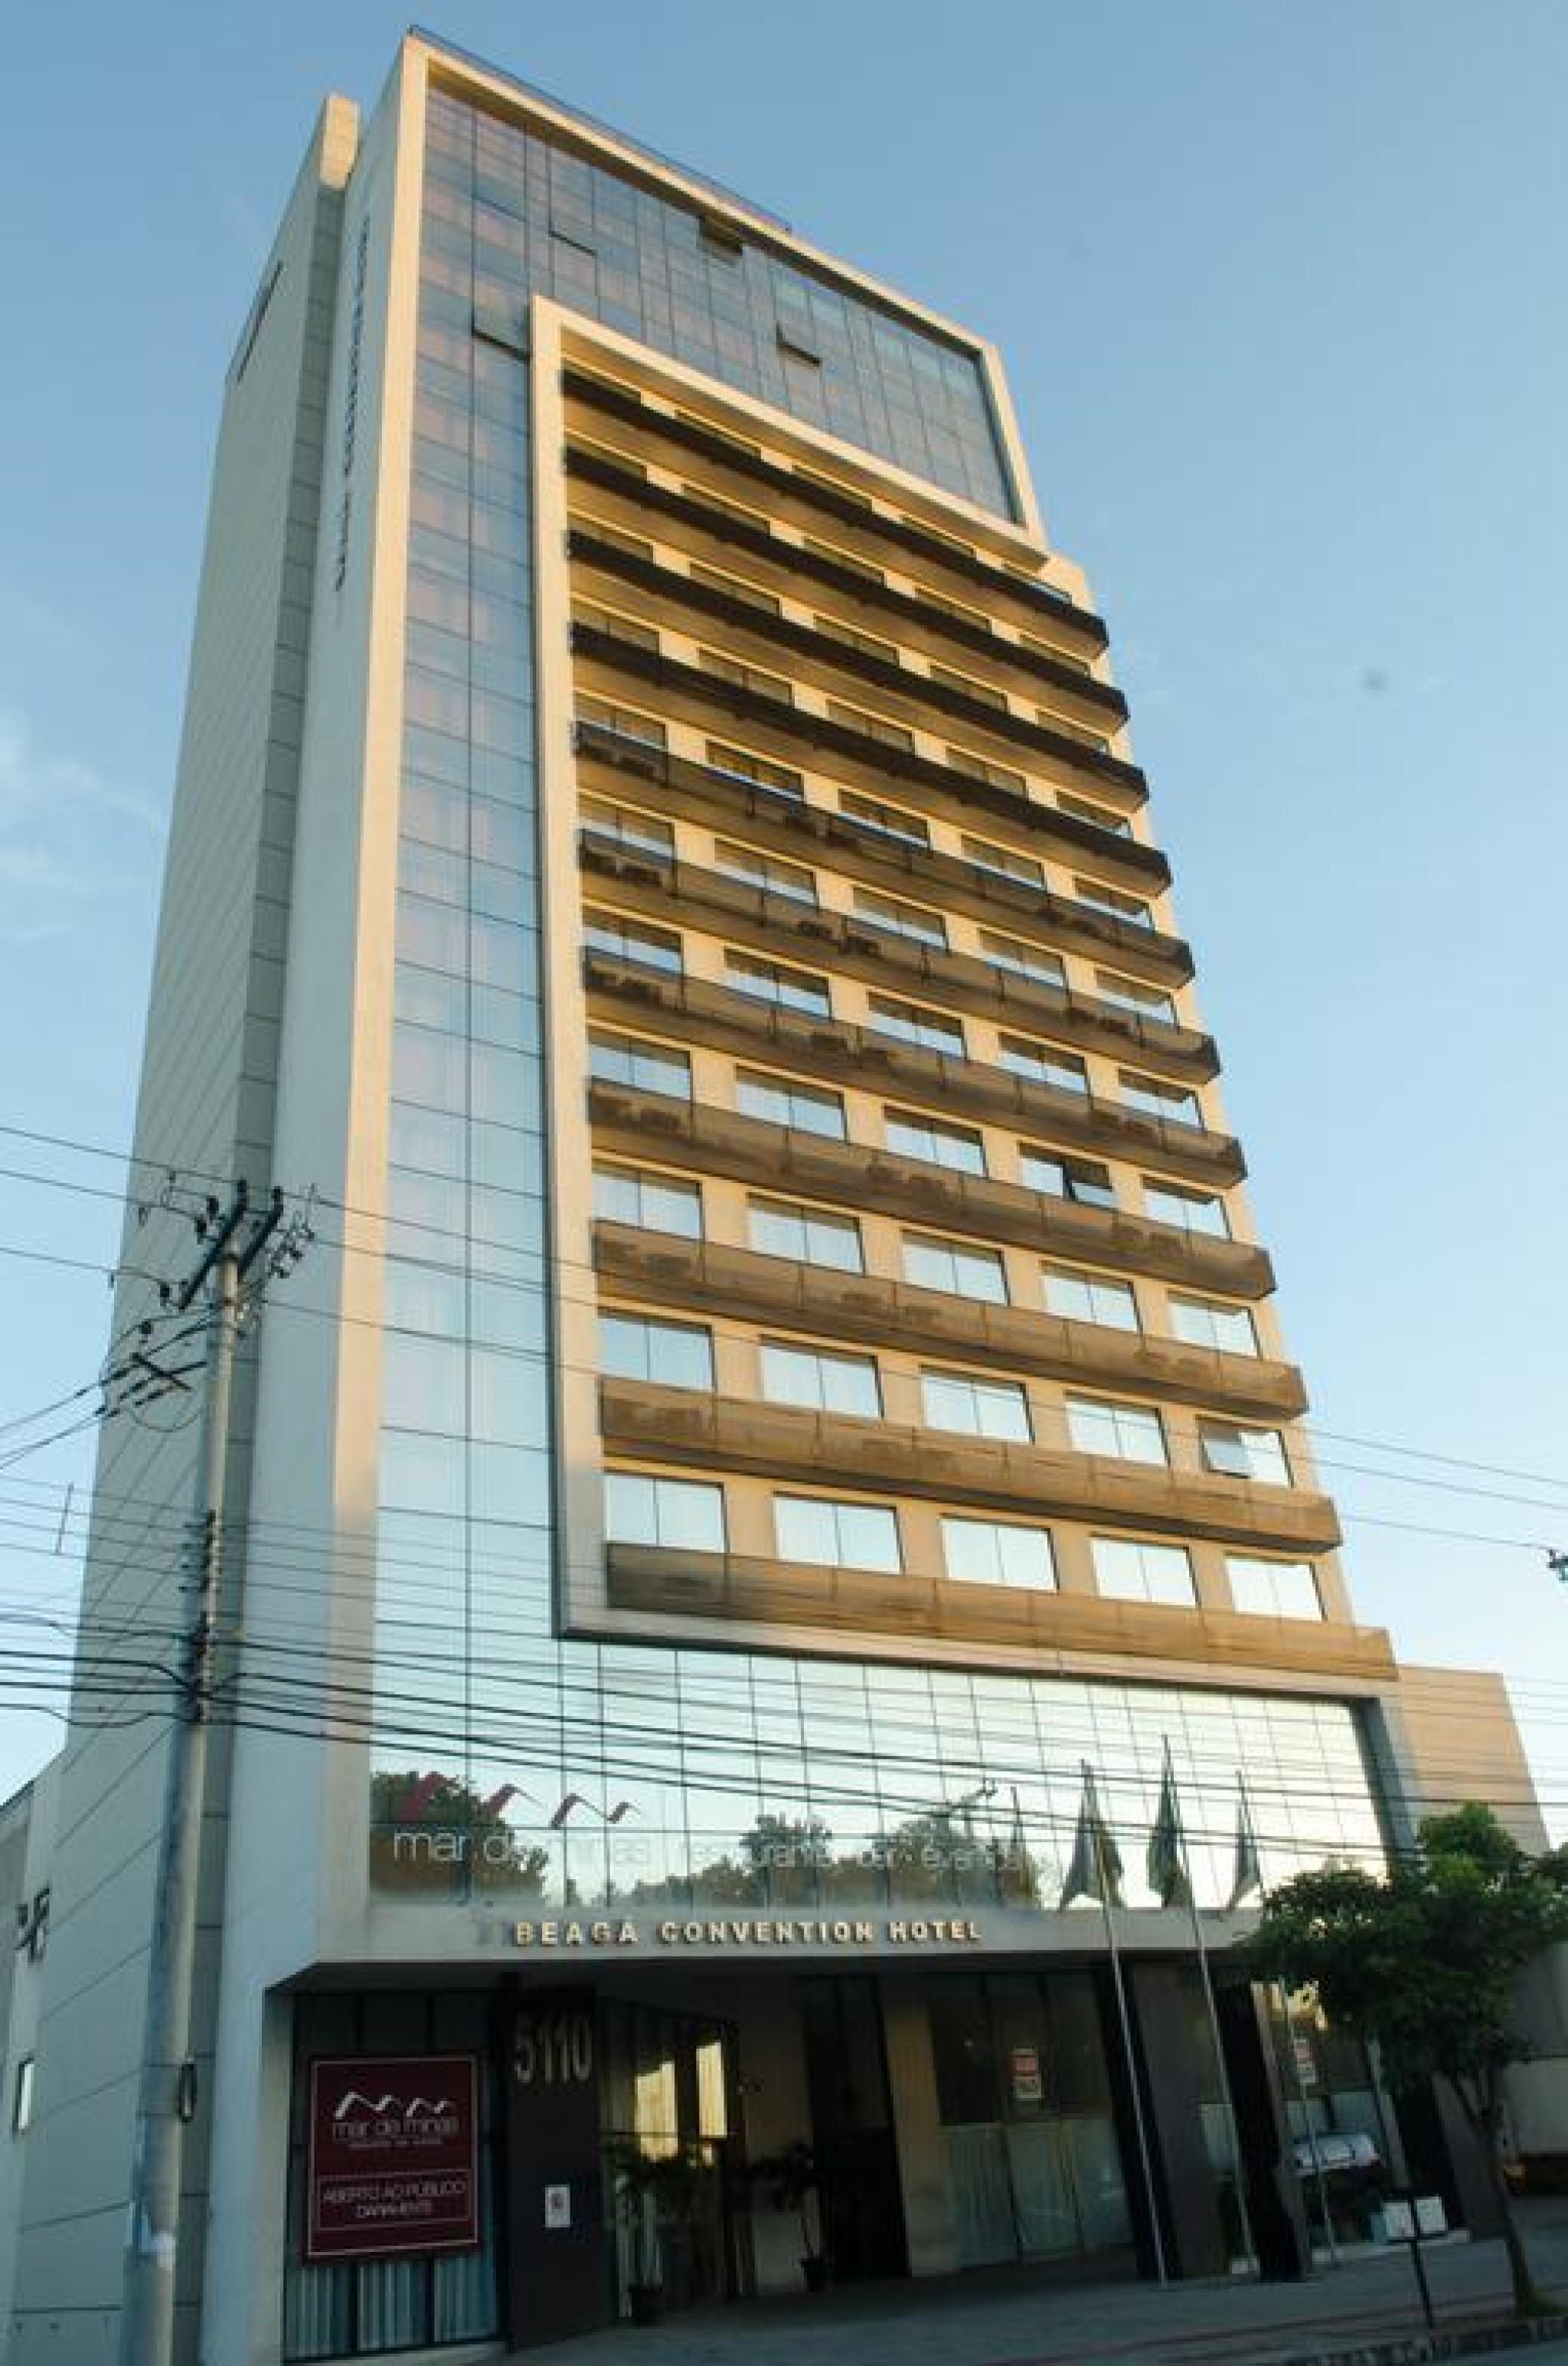 Hotel Beaga Convention Expominas by MHB, Belo Horizonte